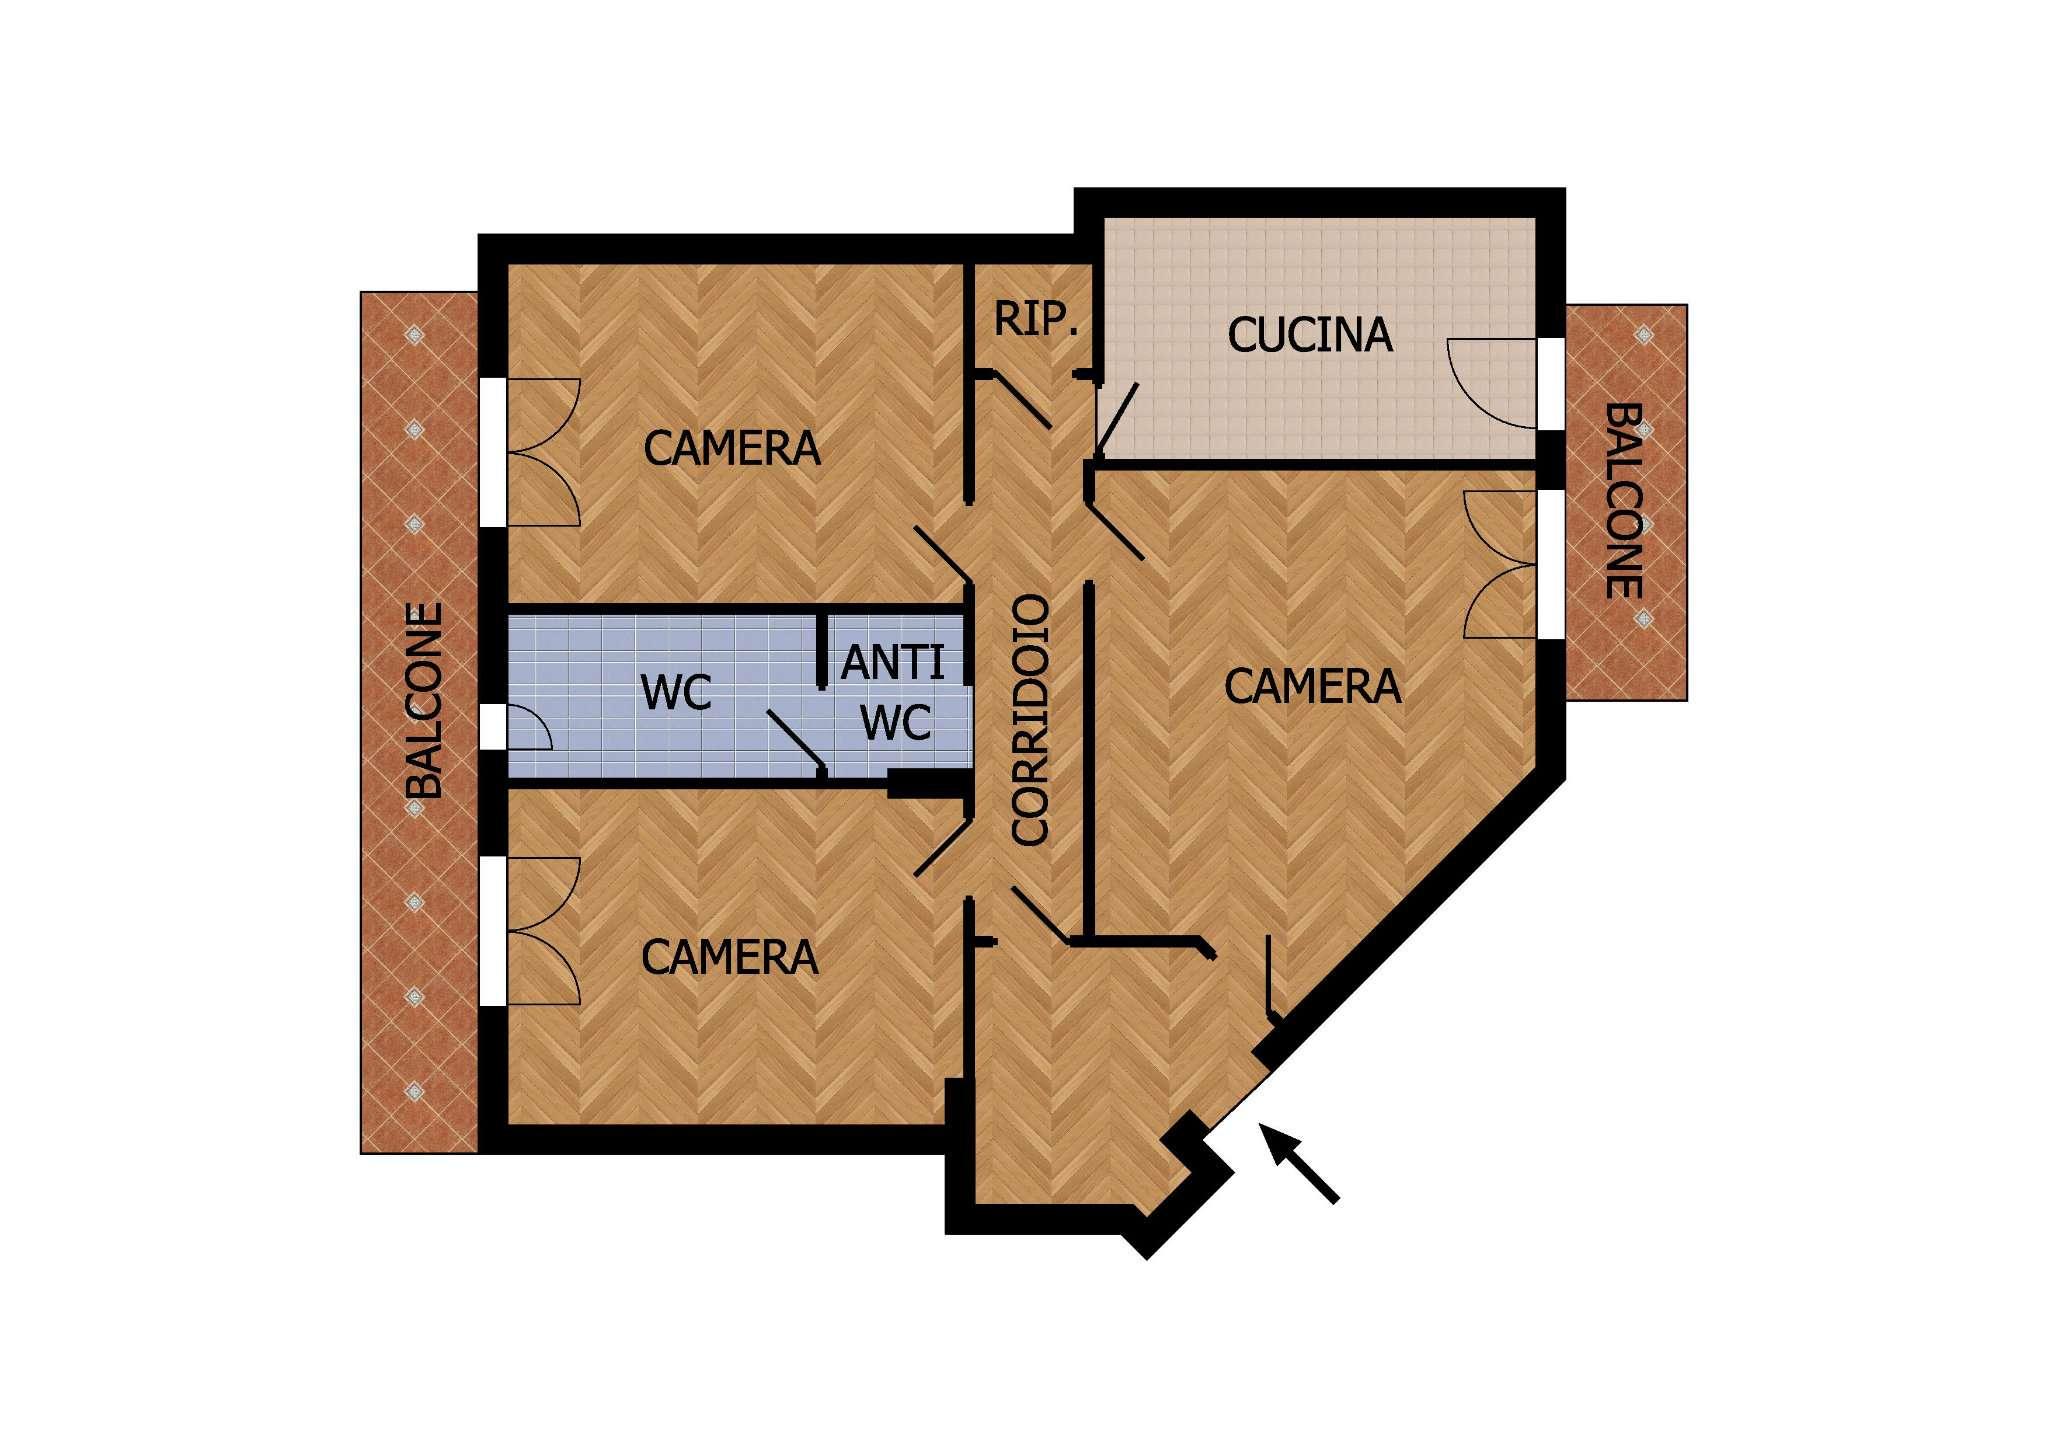 Appartamento, Botteghelle, 0, Vendita - San Giorgio A Cremano